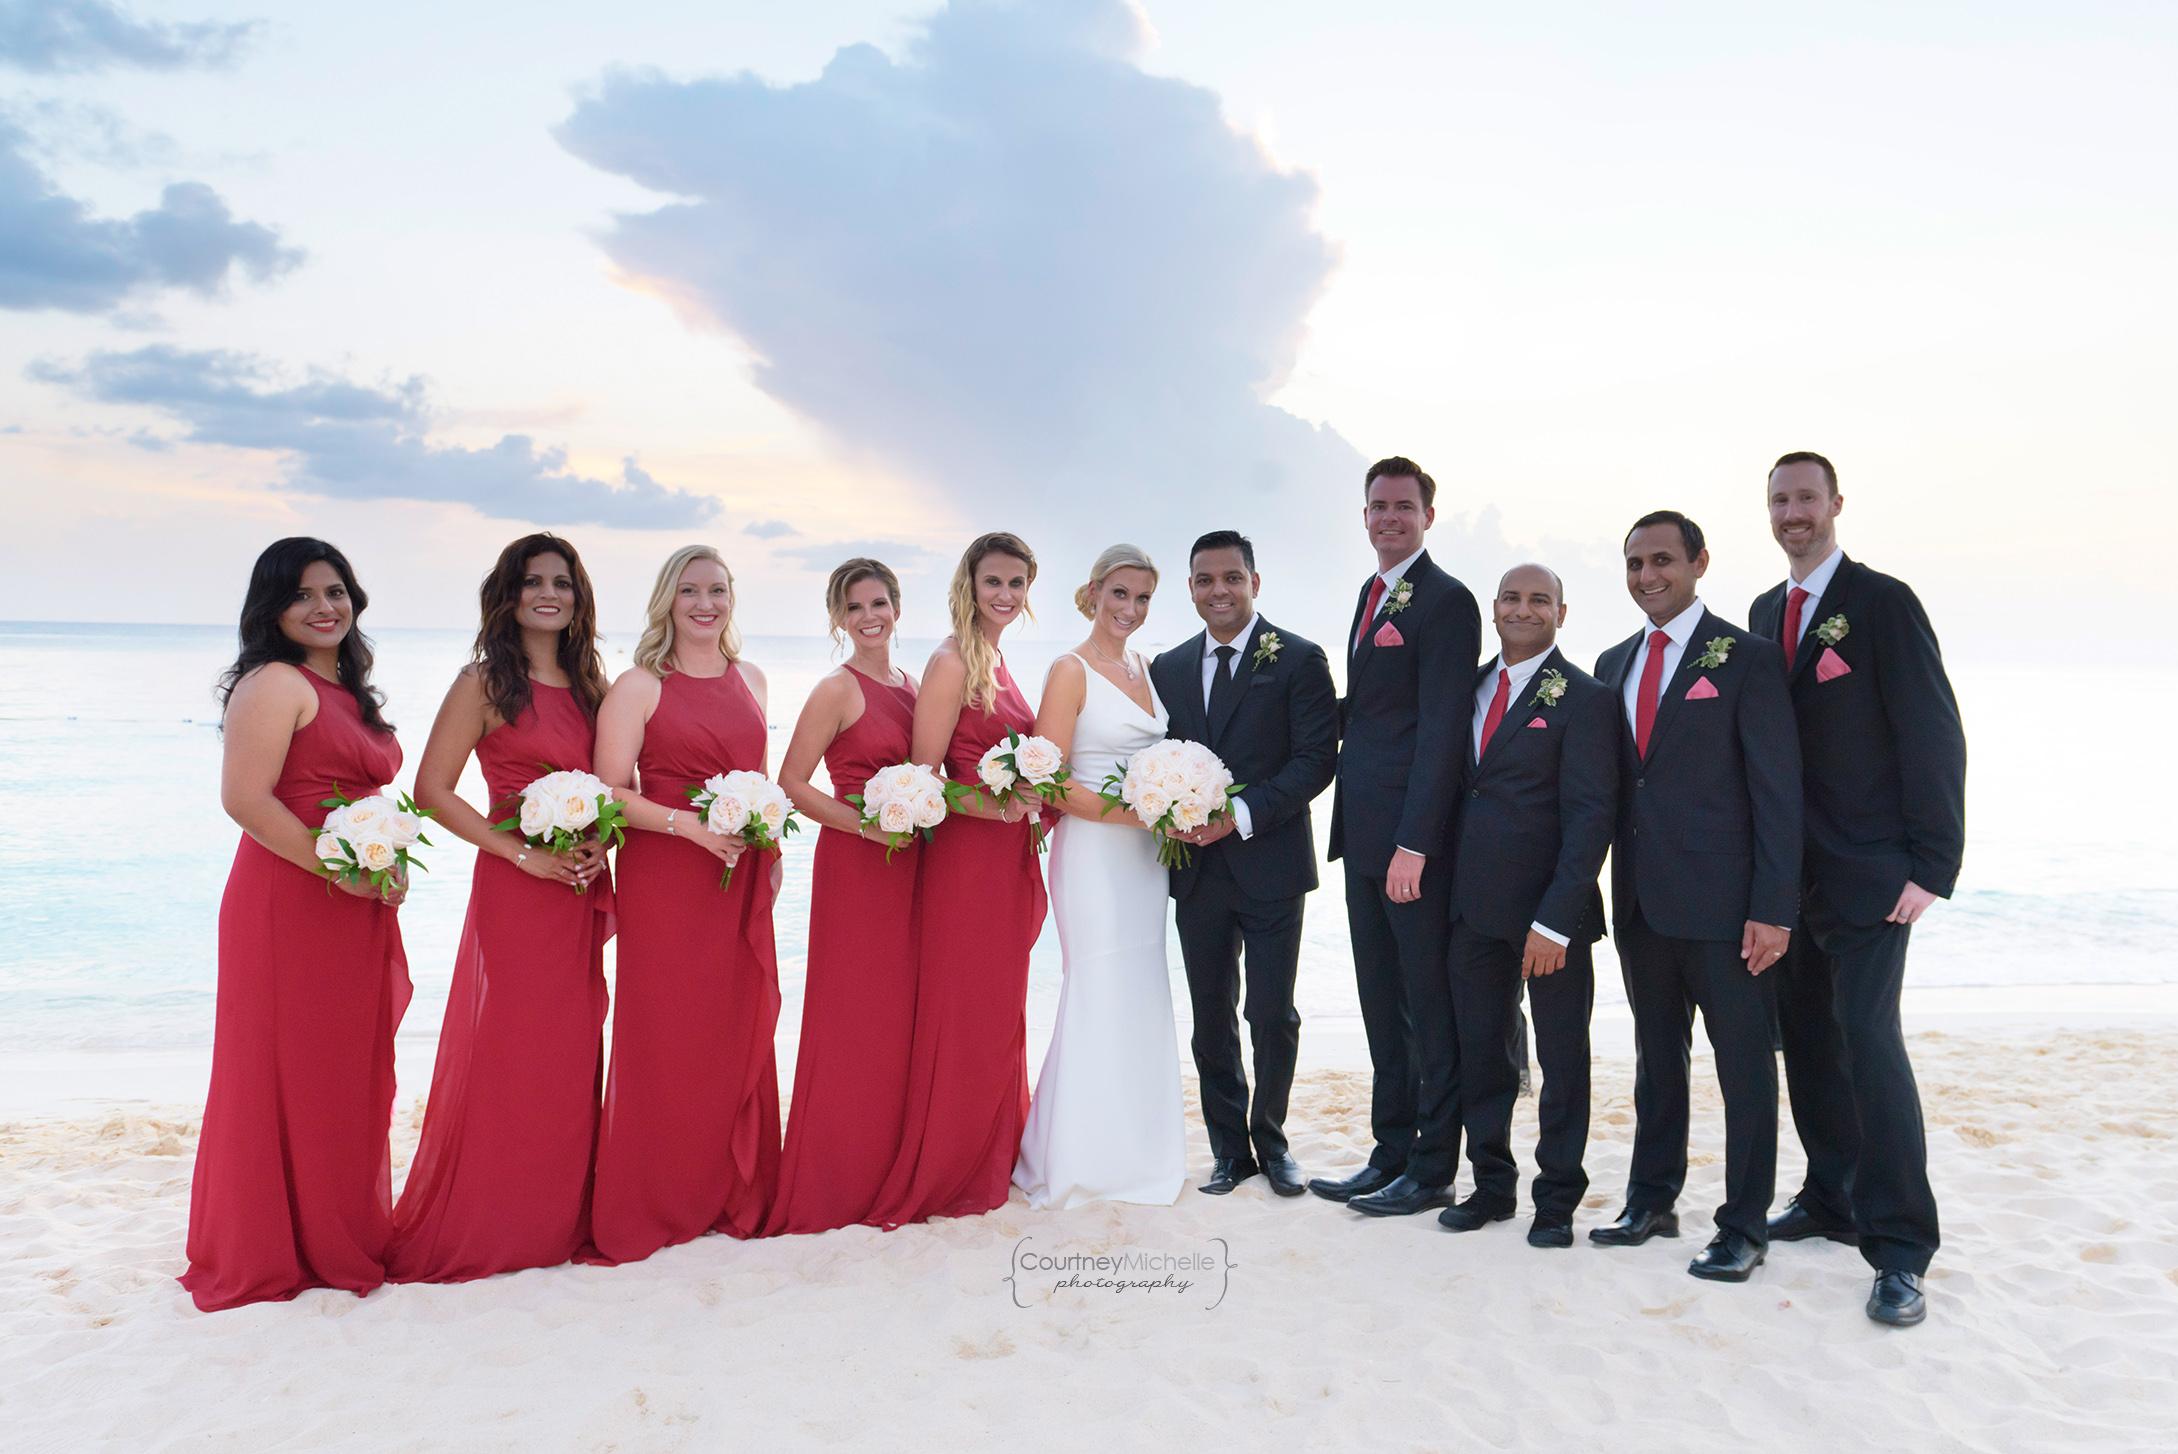 wedding-party-grand-cayman-beach-wedding-photography-by-courtney-laper©CopyrightCMP-LeaAnneRaj-7945.jpg